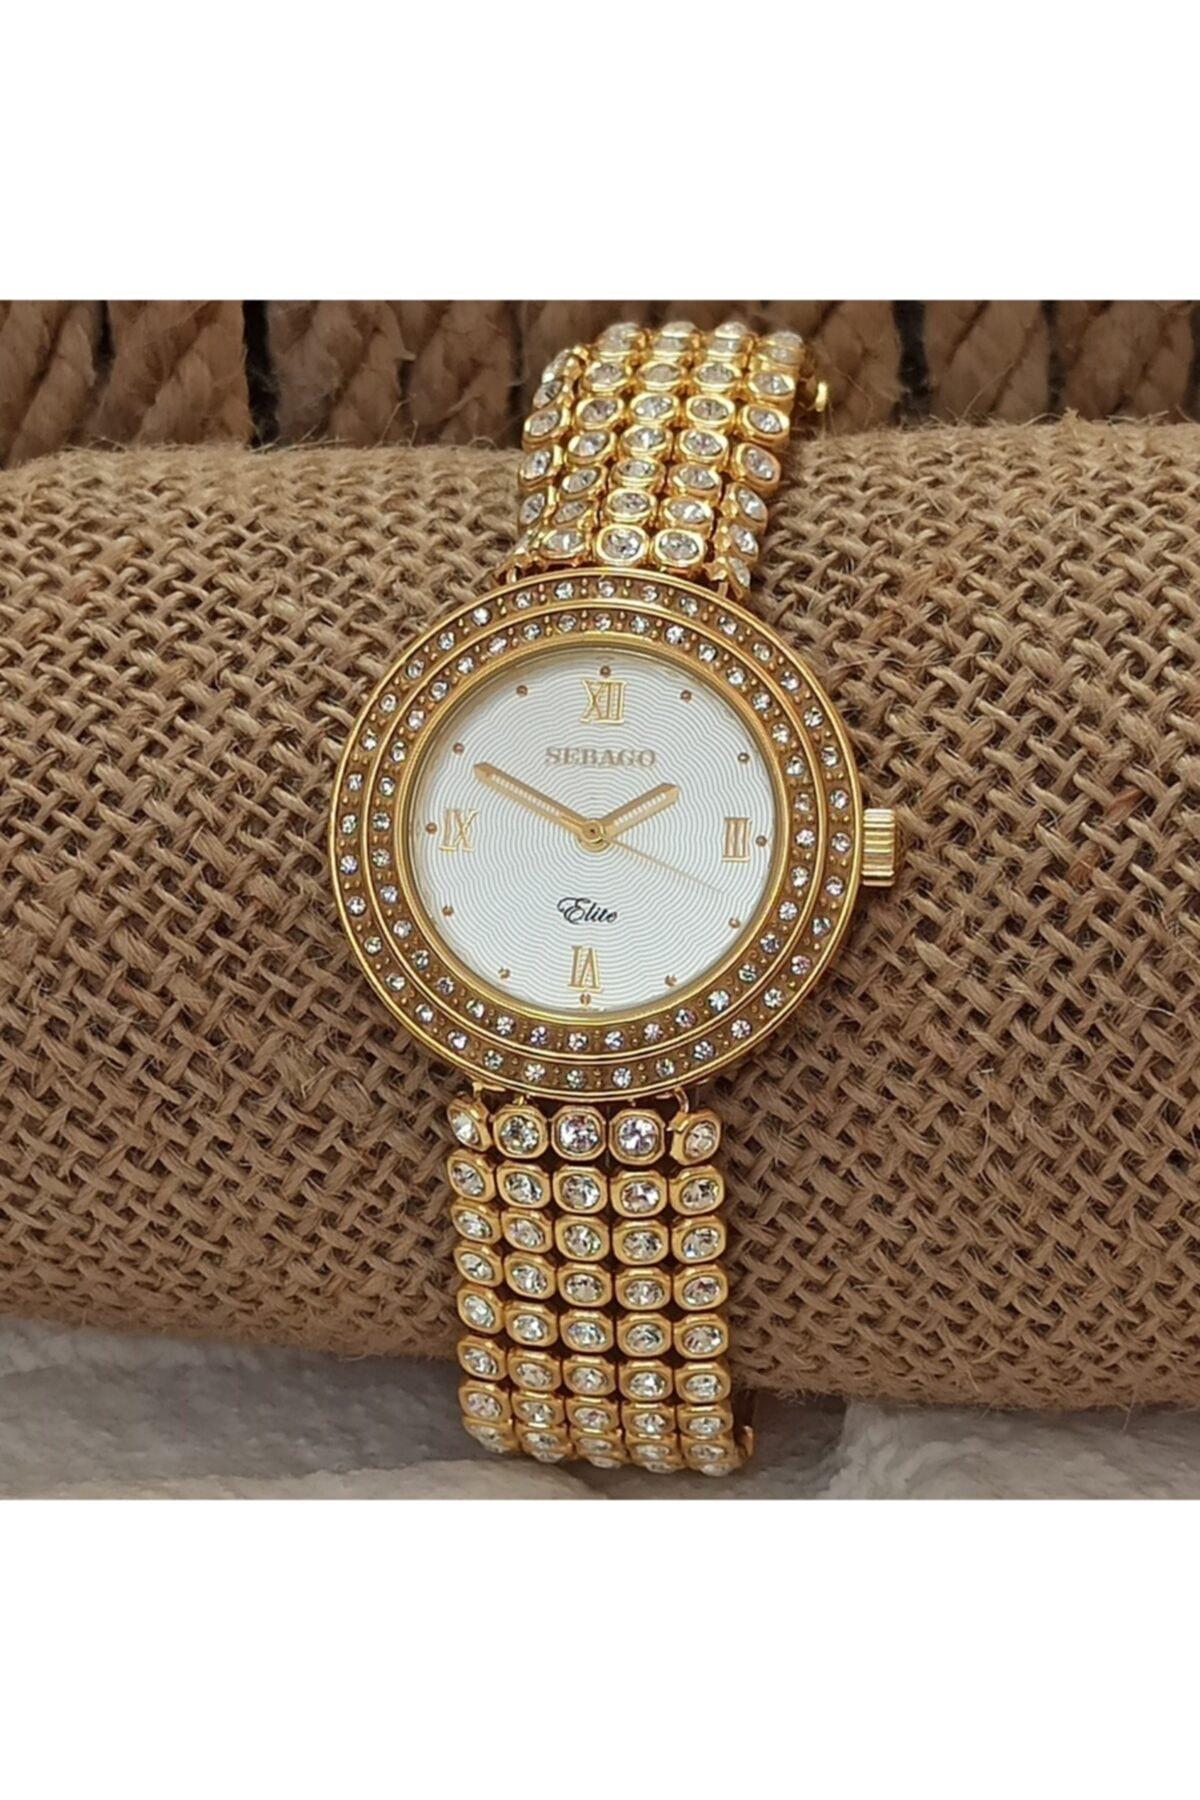 Sebago Sbgs8377-1 Kadın Kol Saati 1